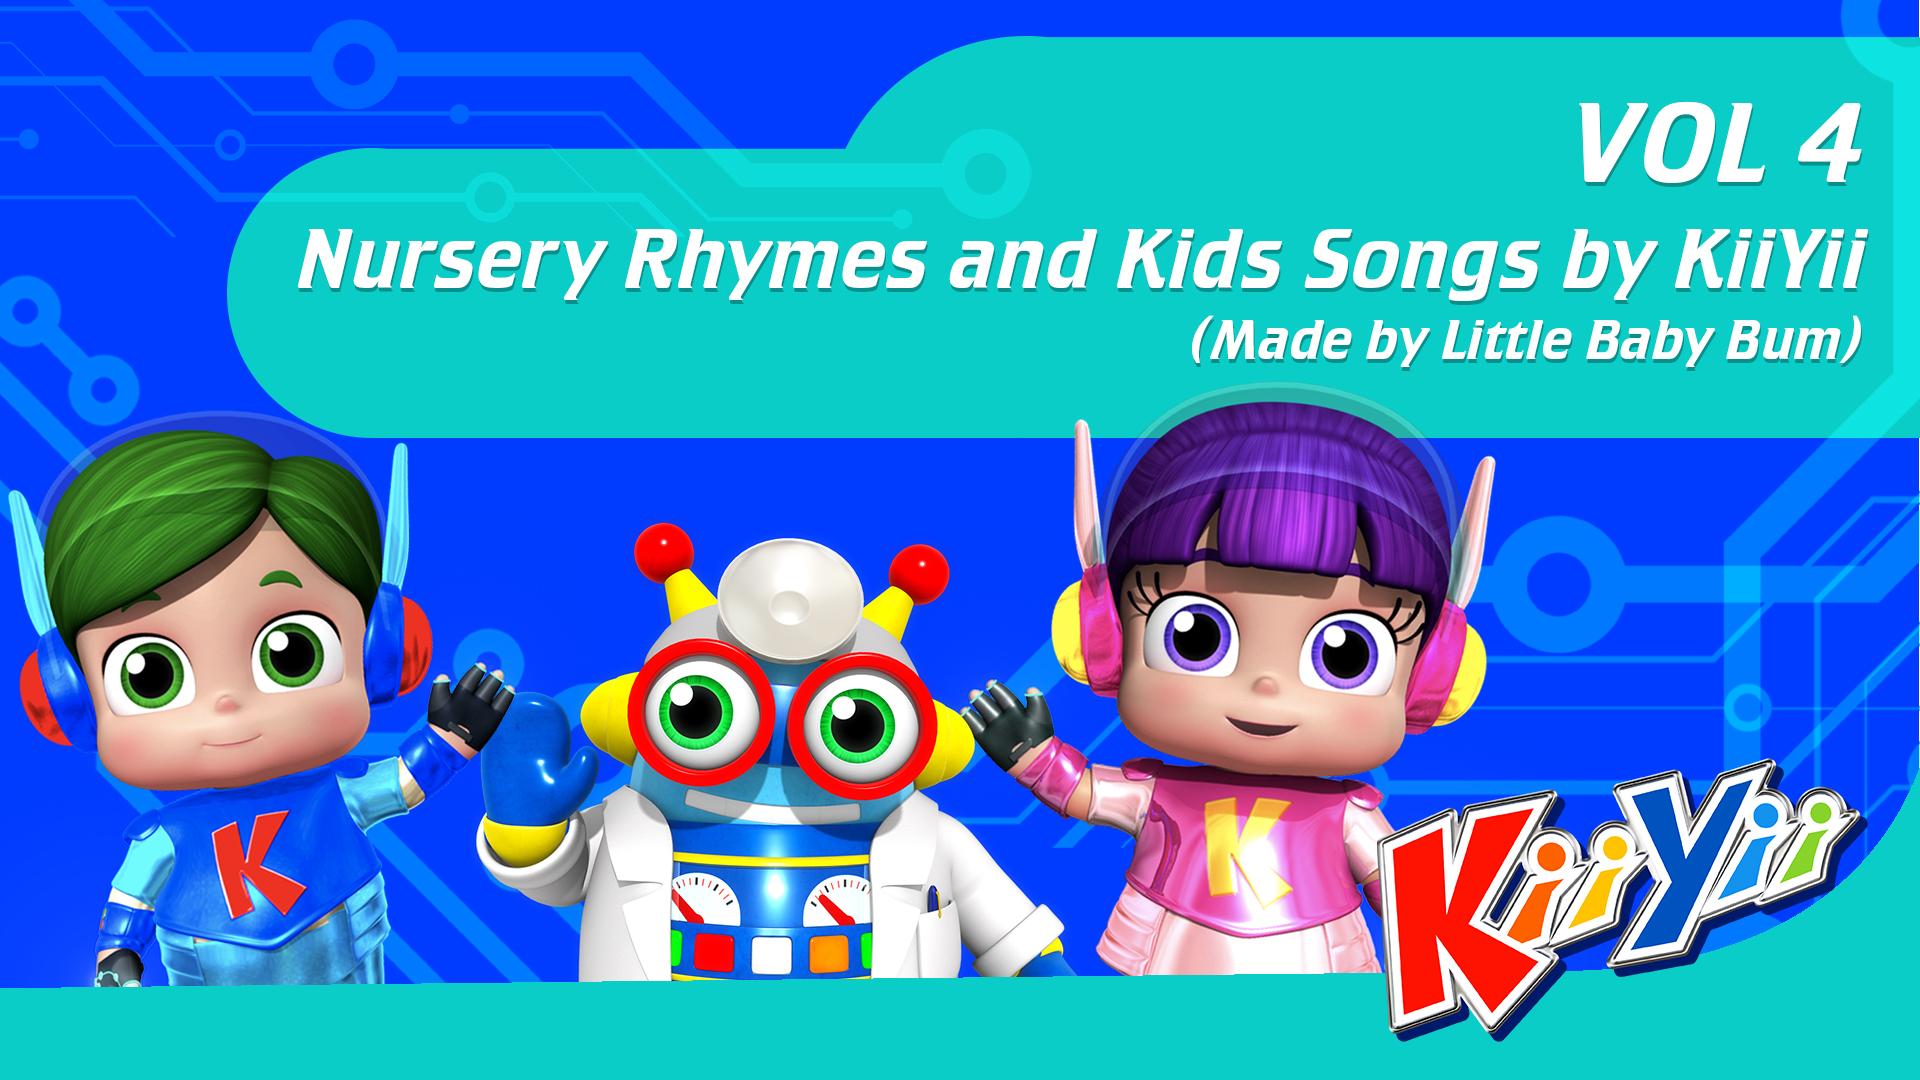 Nursery Rhymes and Kids Songs by KiiYii (Made by Little Baby Bum)